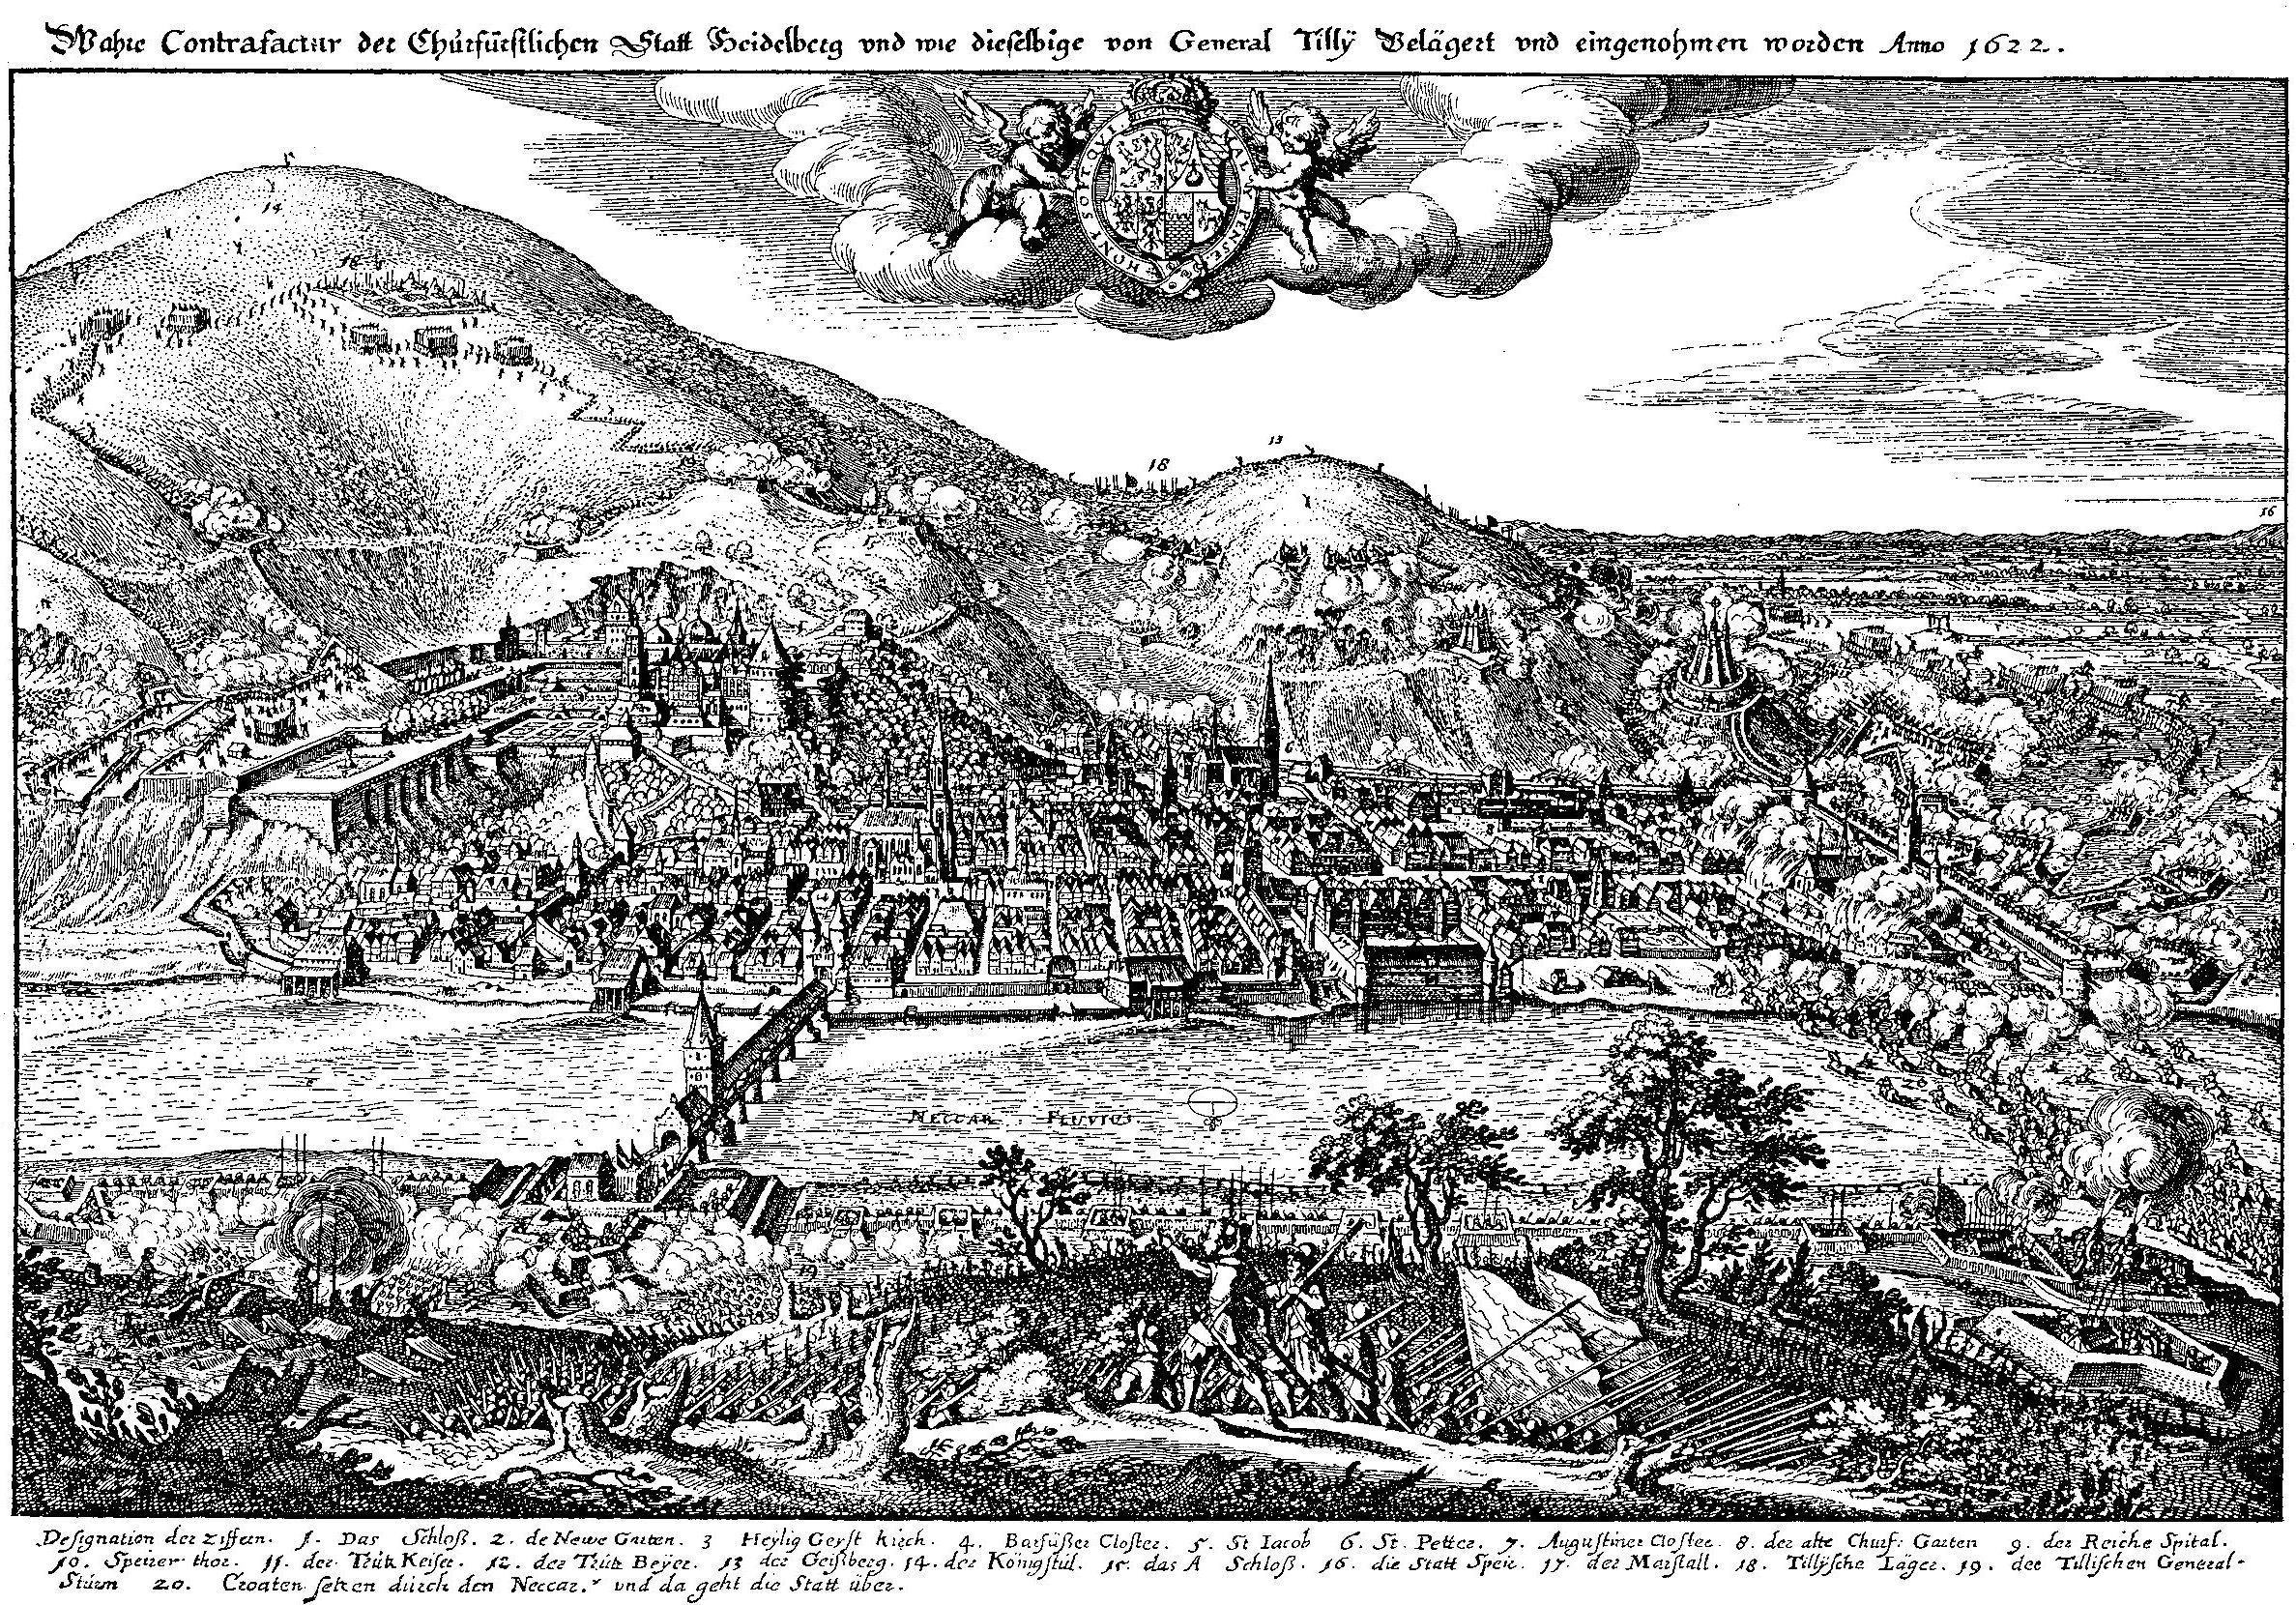 File:Generalsturm auf Heidelberg Merian 1622 1643.jpg